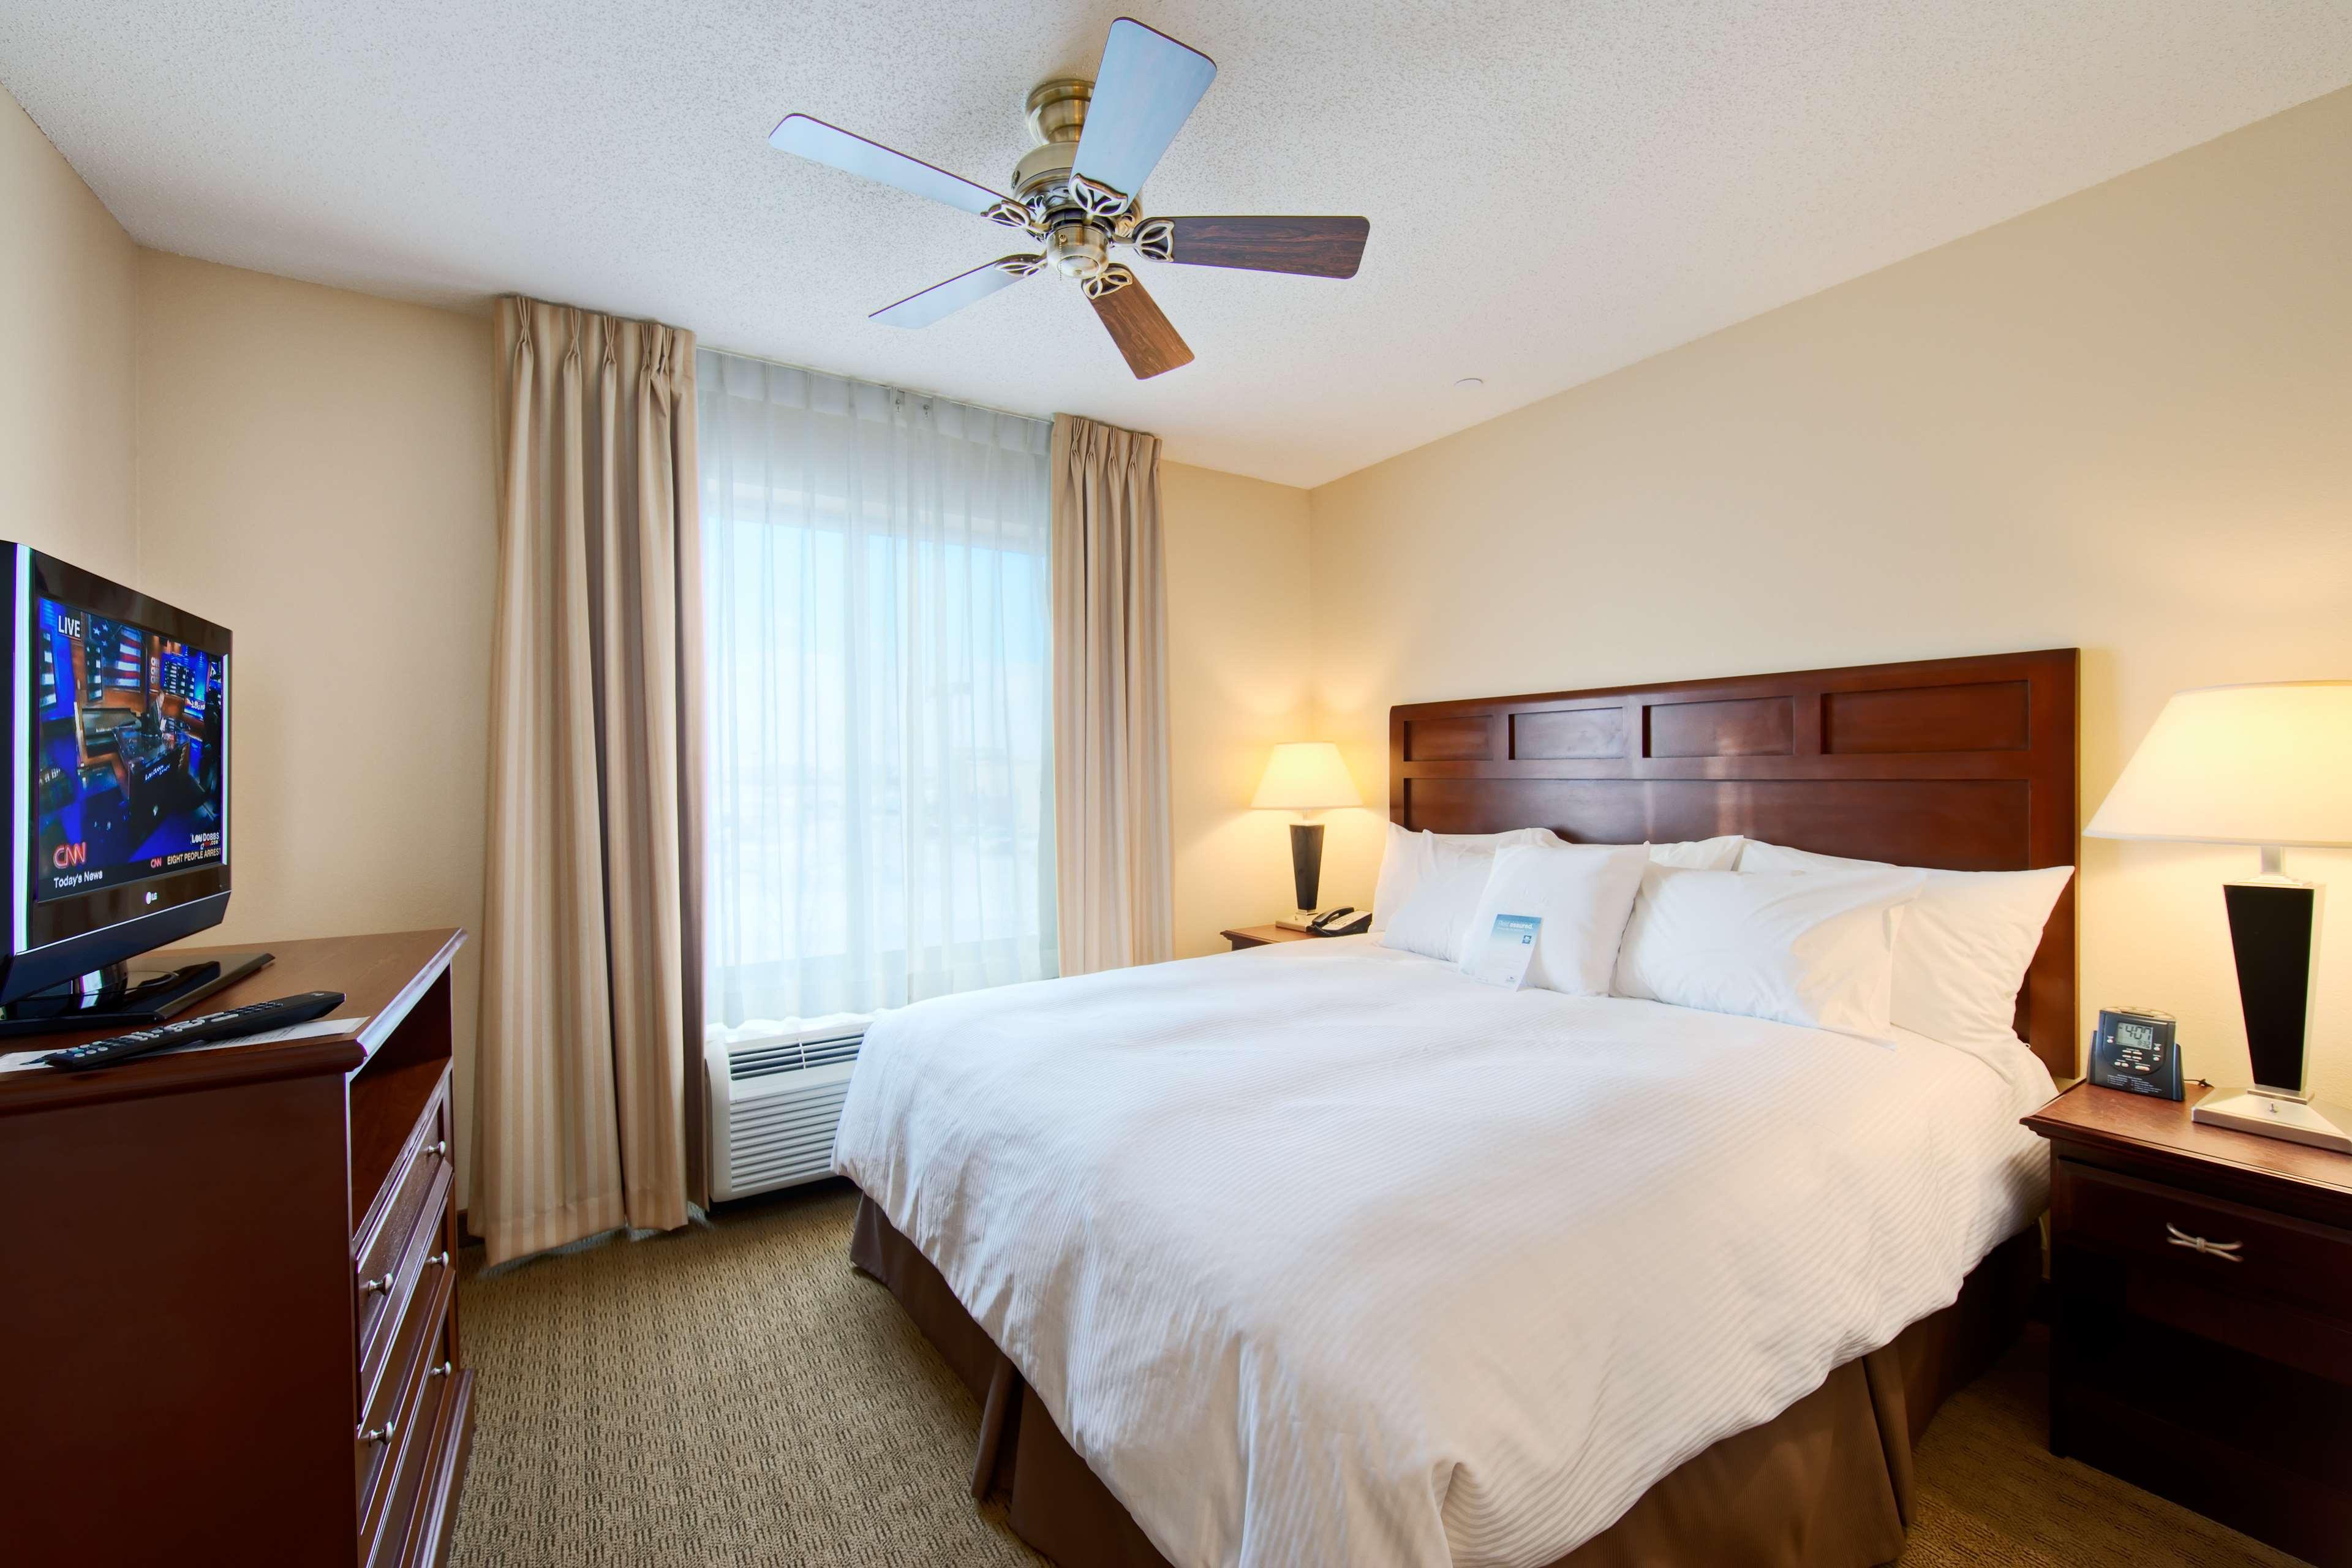 Homewood Suites by Hilton Orland Park image 30